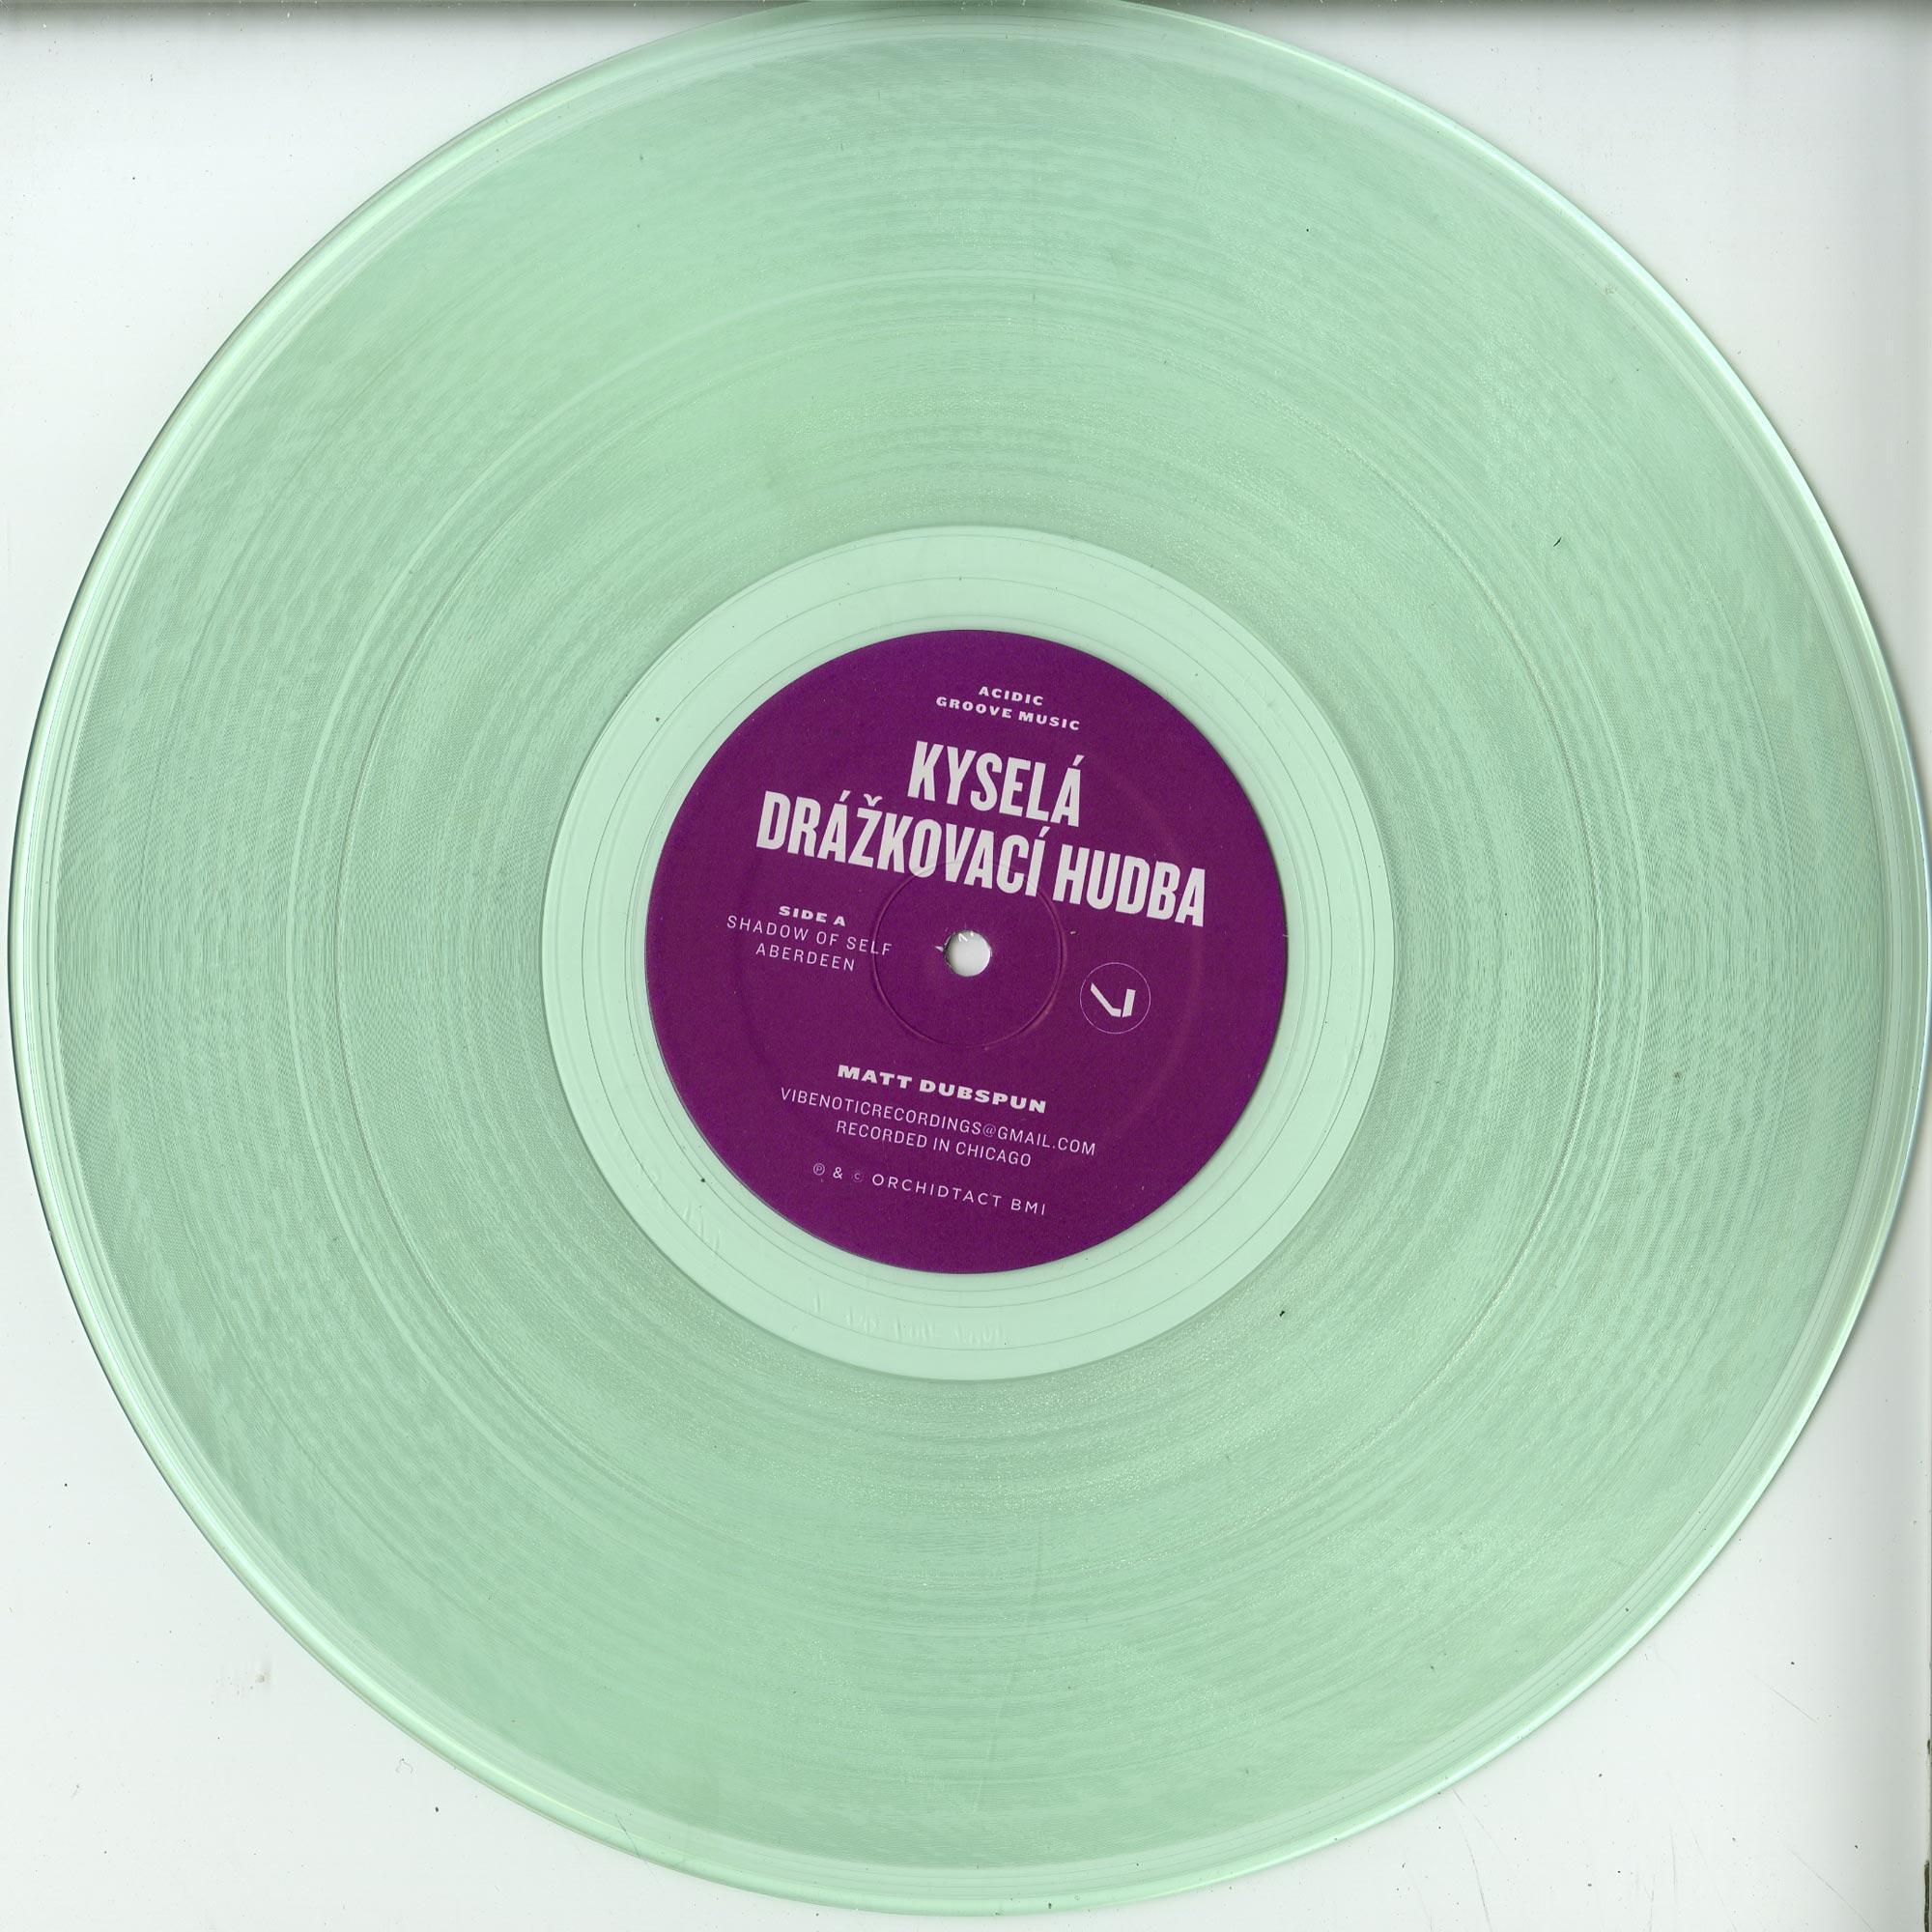 Matt Dubspun - KYSELA DRAZKOVACI HUDBA / ACIDIC GROOVE MUSIC